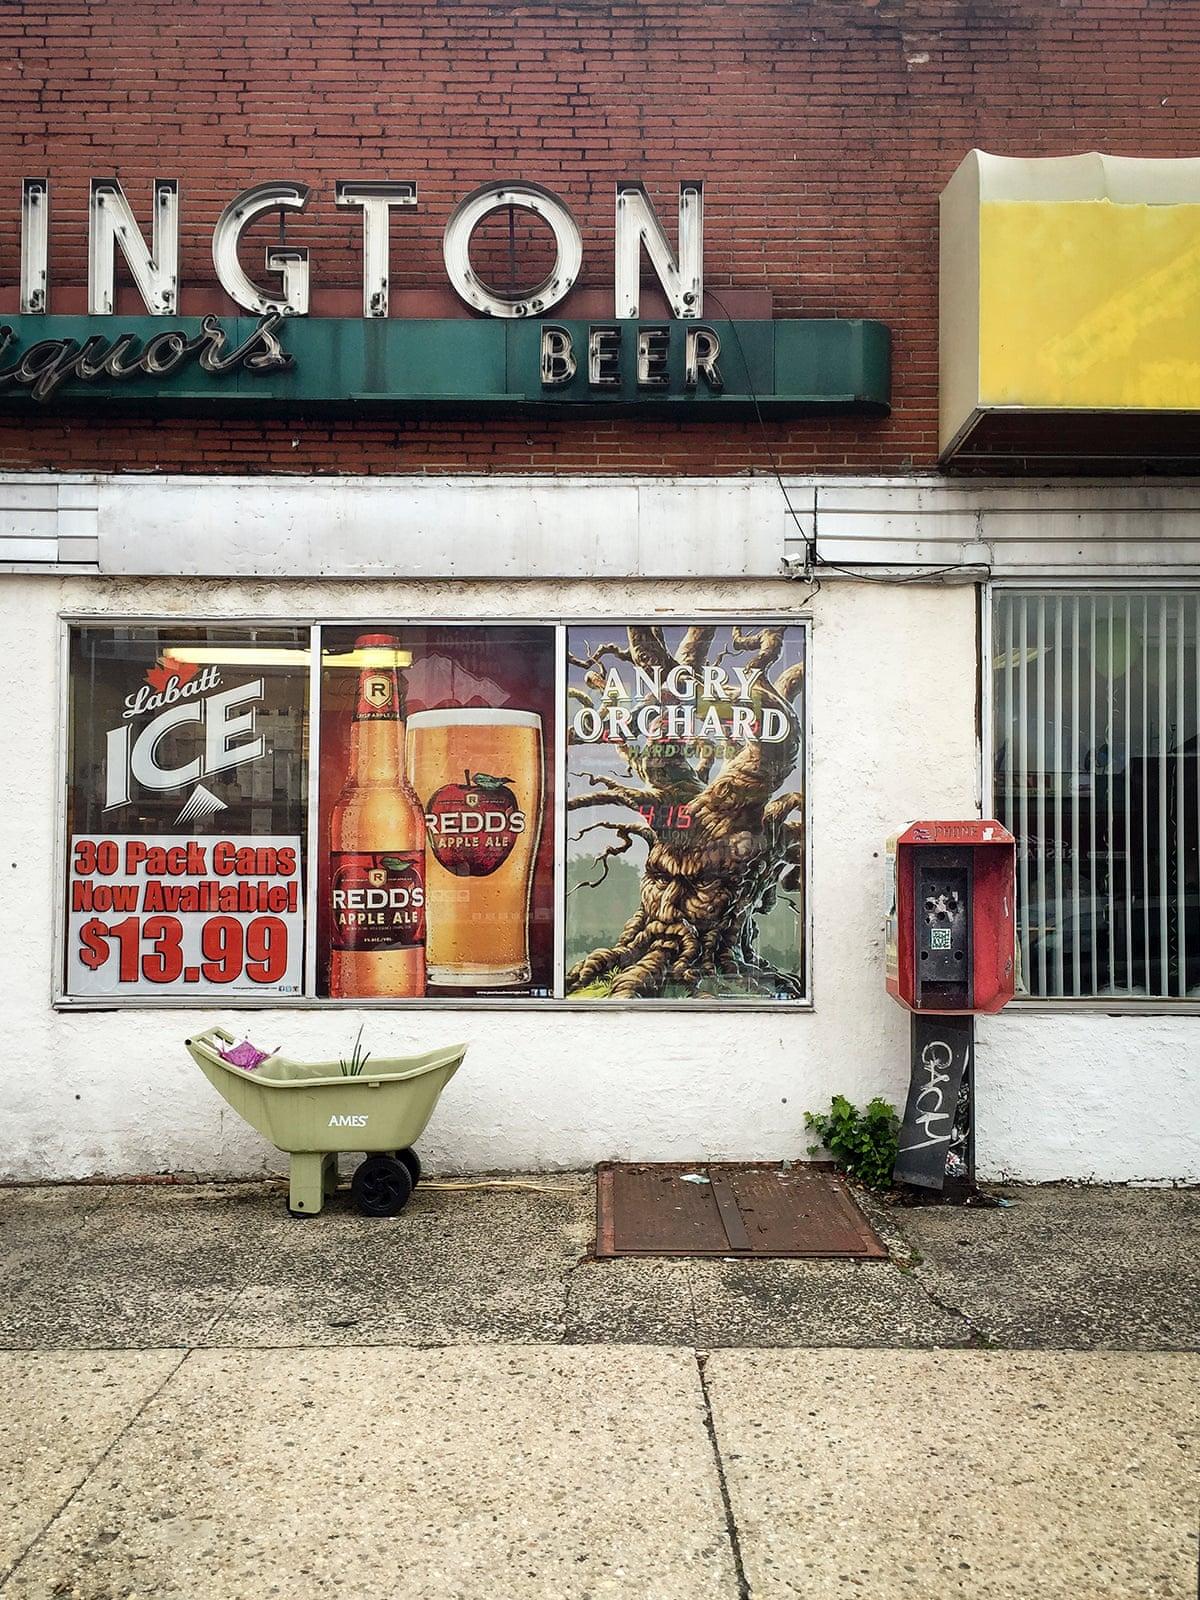 Таксофоны на улицах Нью-Джерси, снятые на iPhone